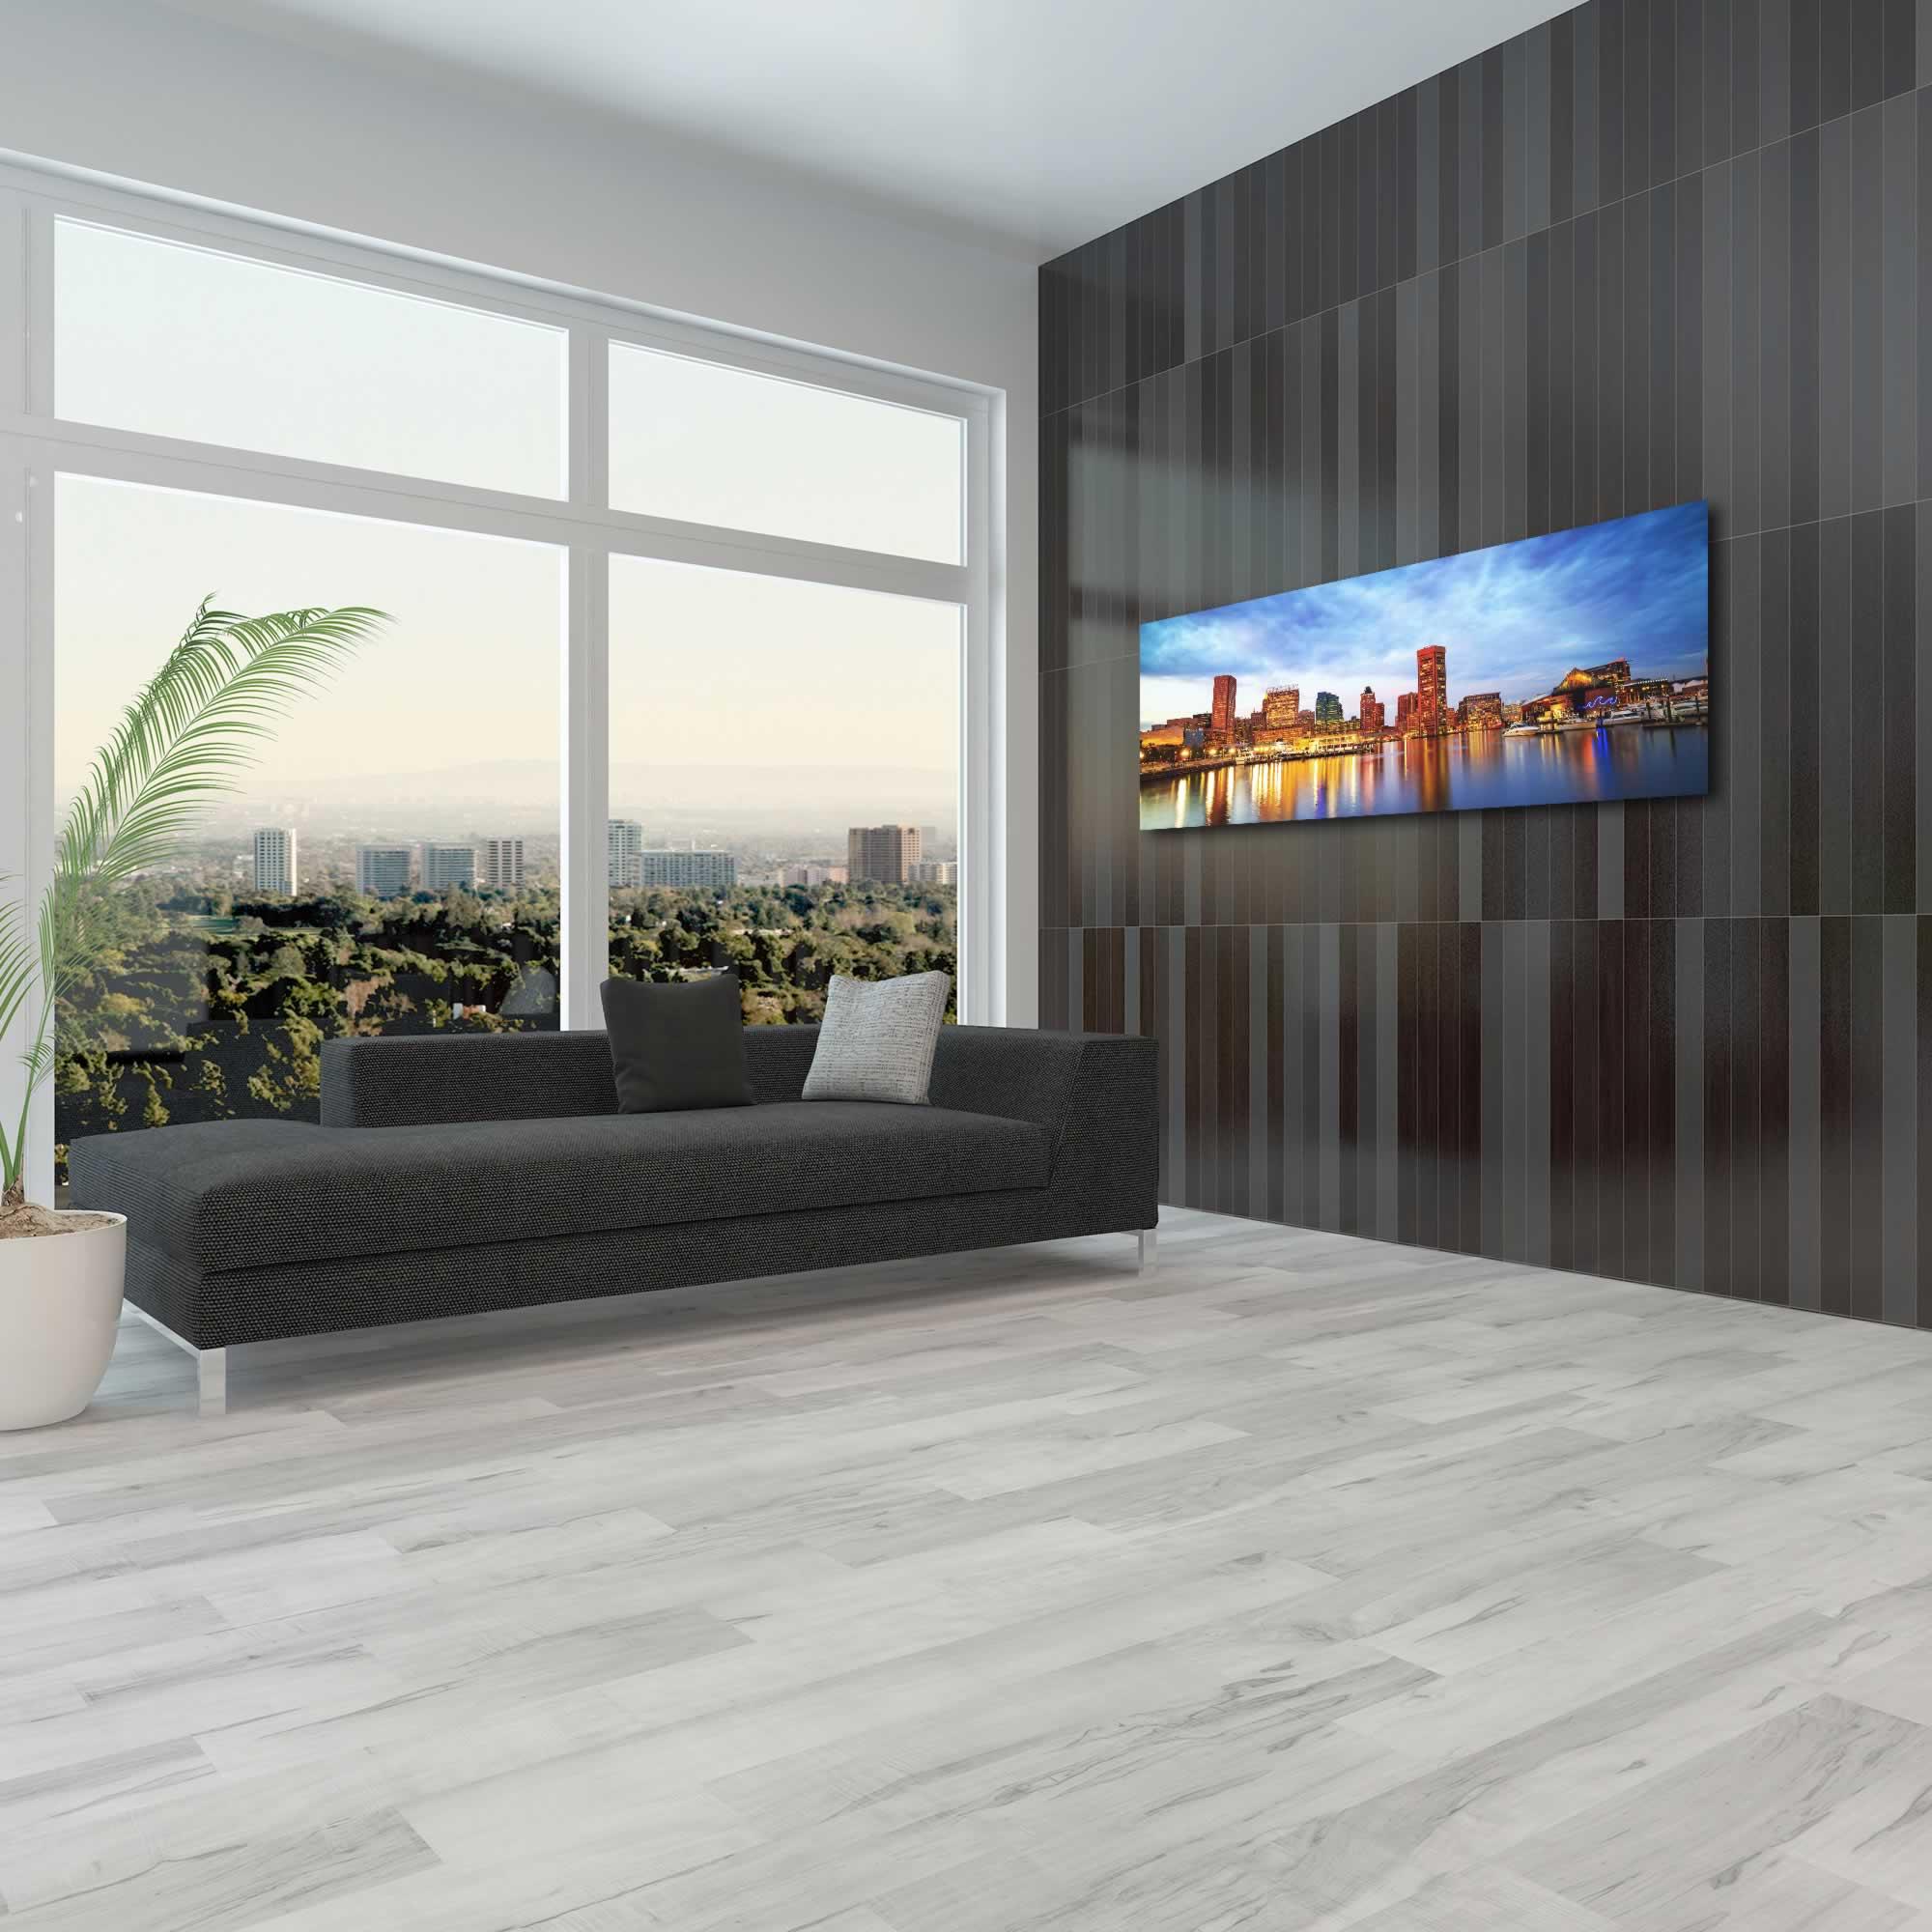 Baltimore City Skyline - Urban Modern Art, Designer Home Decor, Cityscape Wall Artwork, Trendy Contemporary Art - Alternate View 3